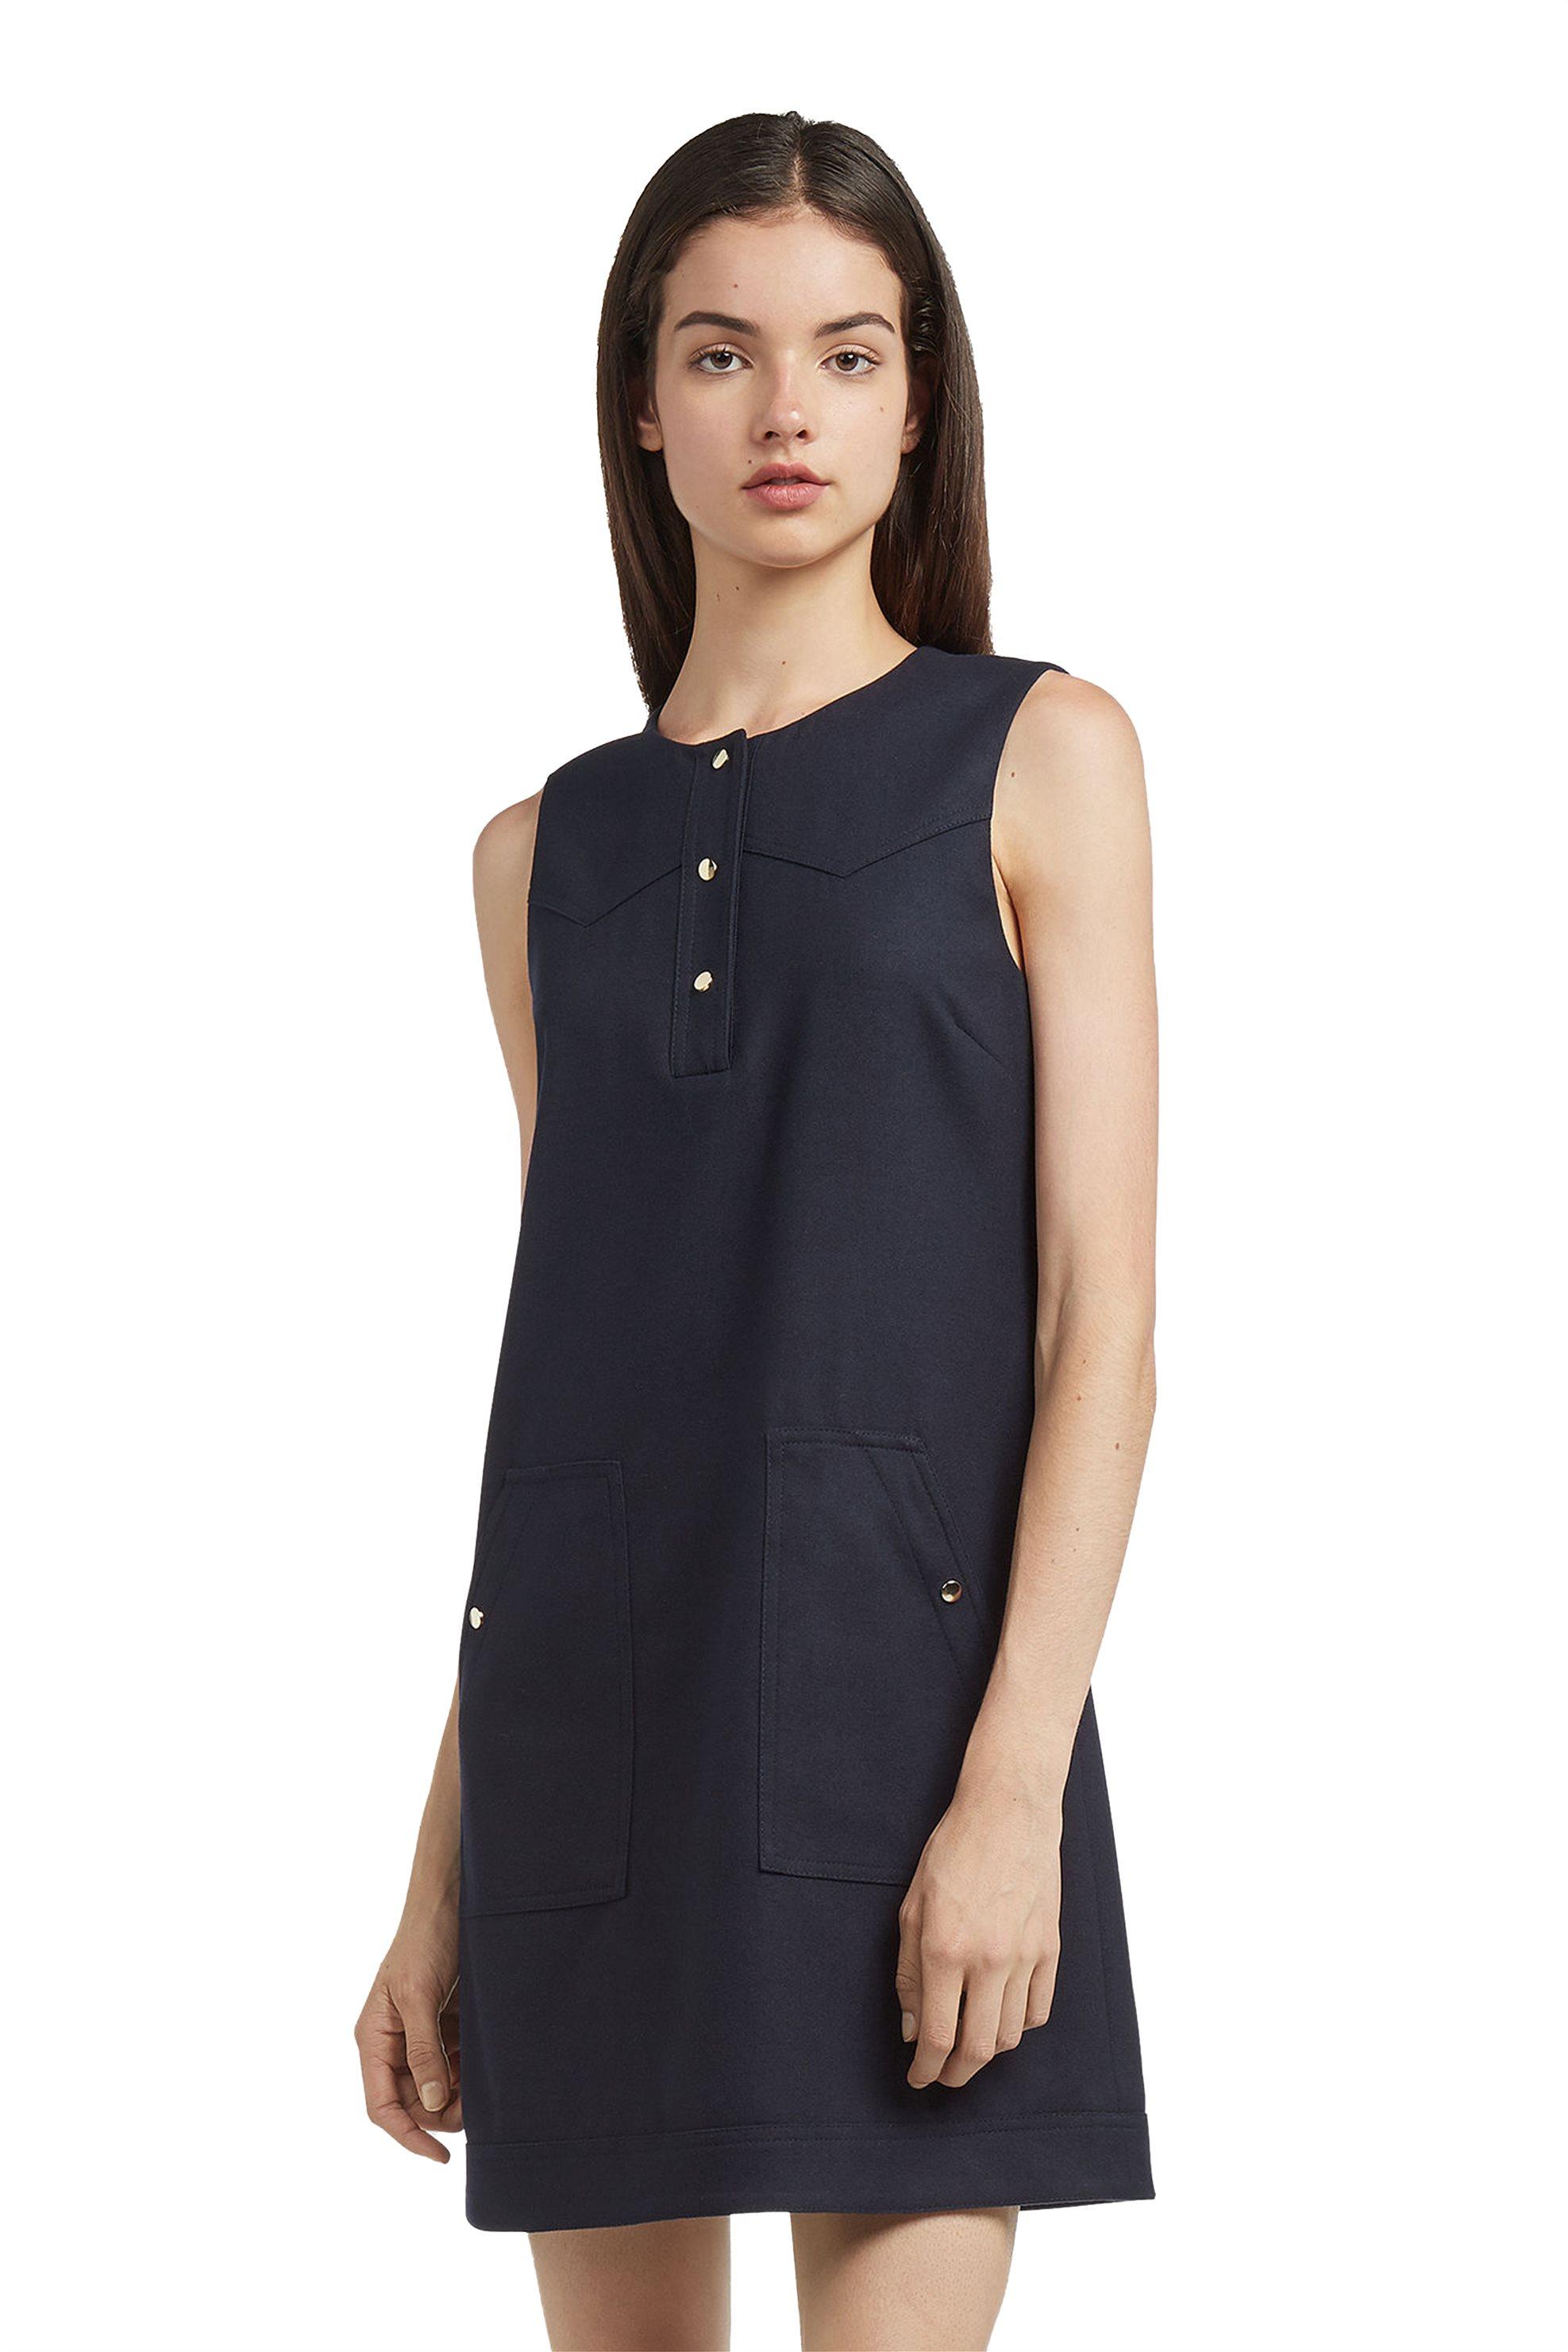 Trussardi Jeans γυναικείο φόρεμα αμάνικο με κουμπάκια - 56D00156-1T001548 - Μπλε γυναικα   ρουχα   φορέματα   mini φορέματα